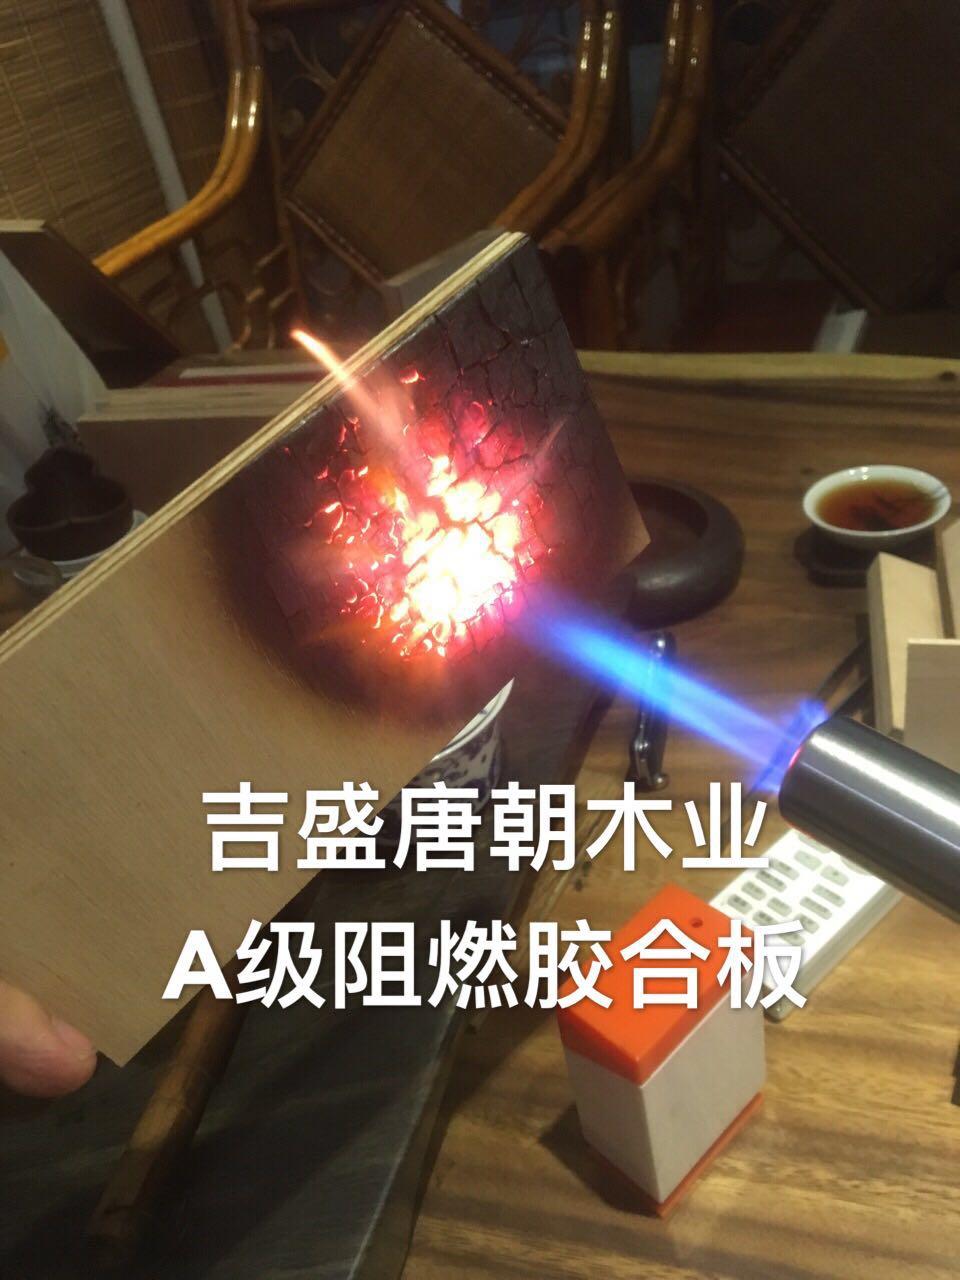 A级阻燃胶合板